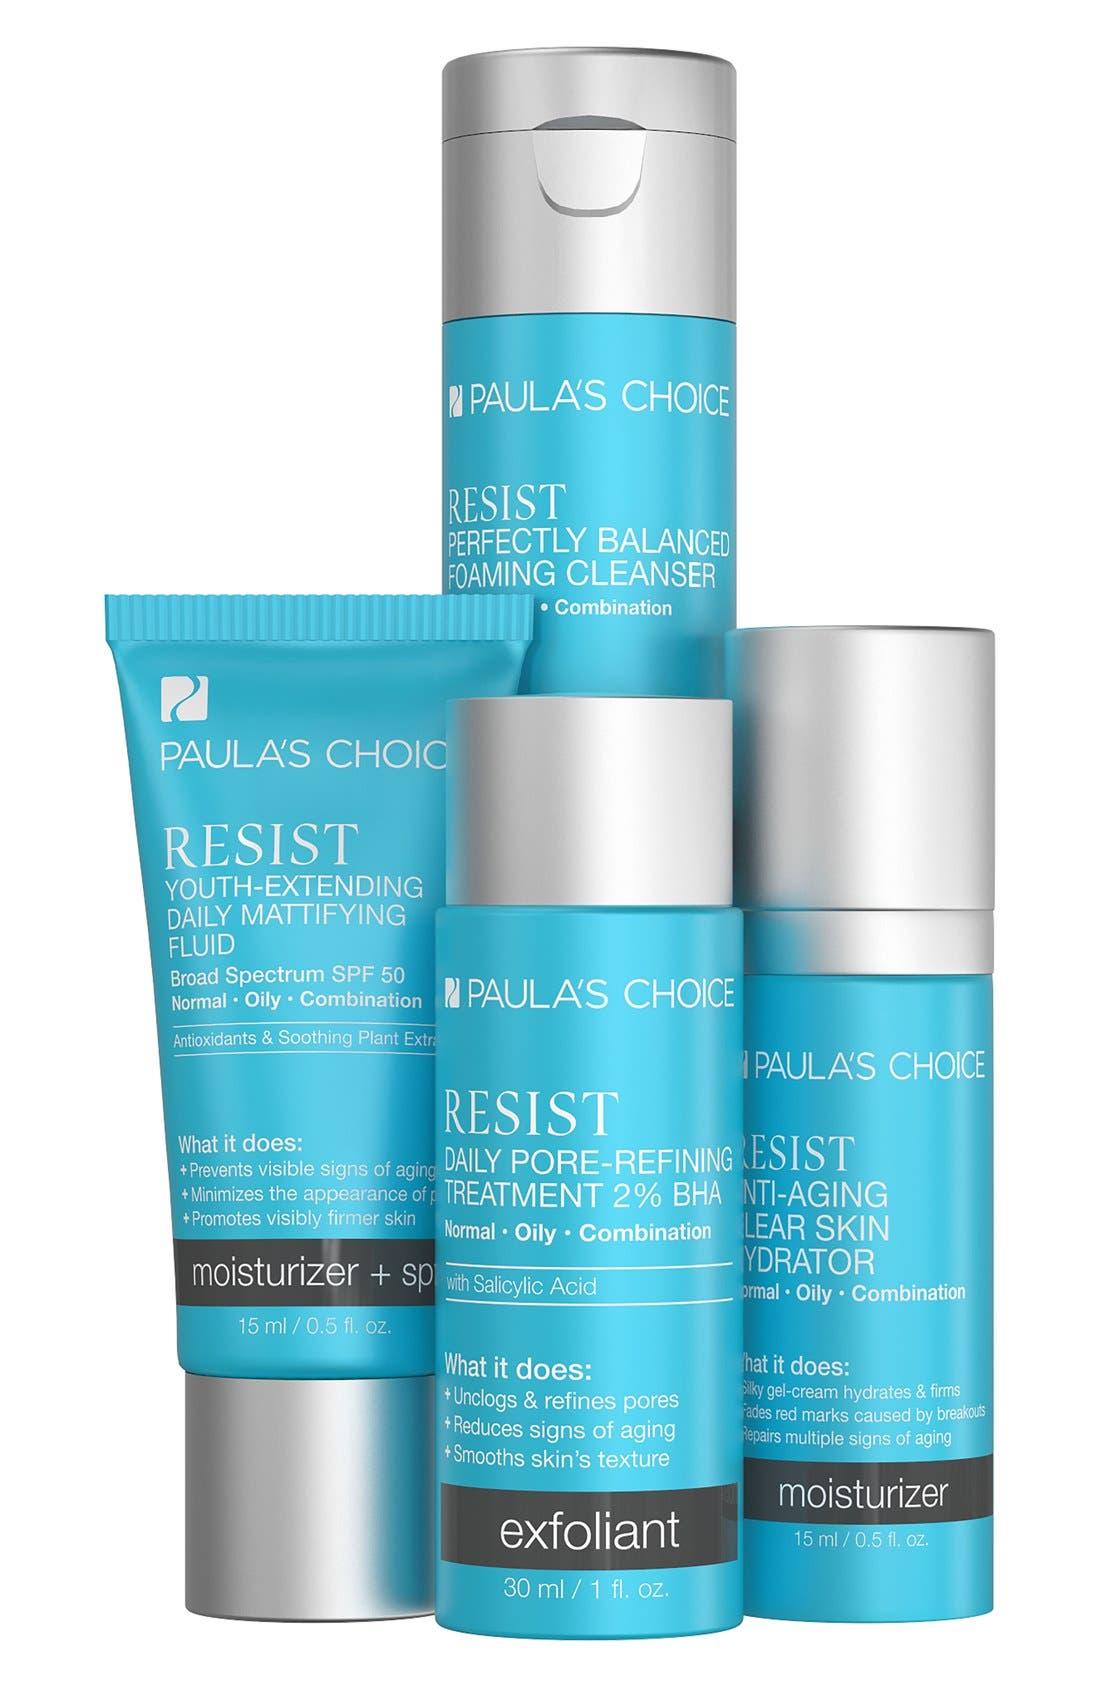 Paula's Choice Resist Trial Kit for Wrinkles & Breakouts